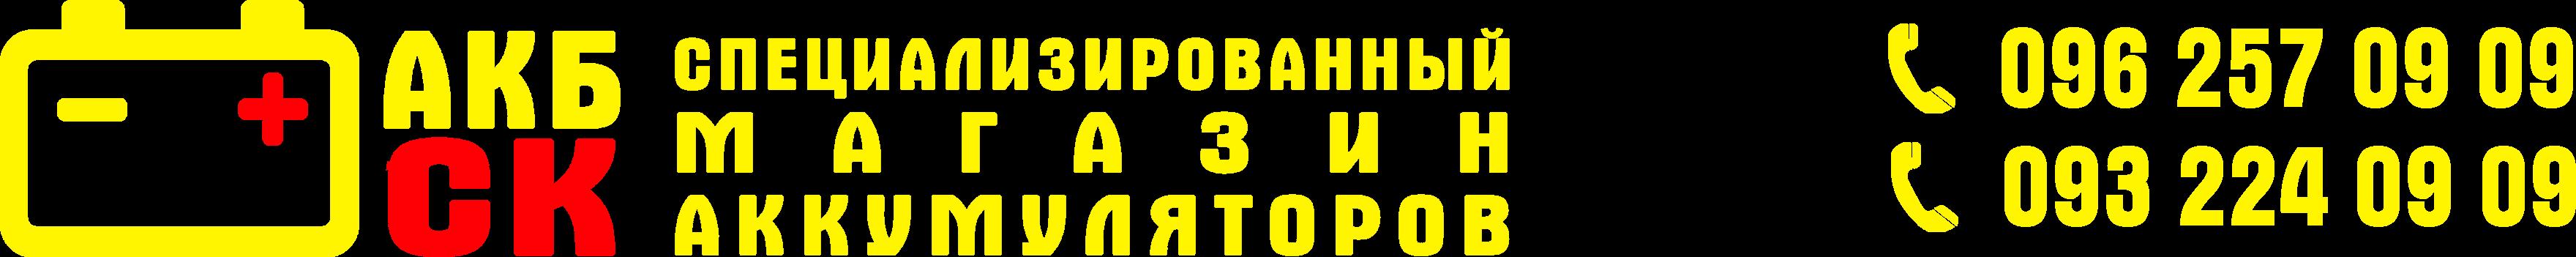 АКБ CK Аккумуляторы в Черкассах